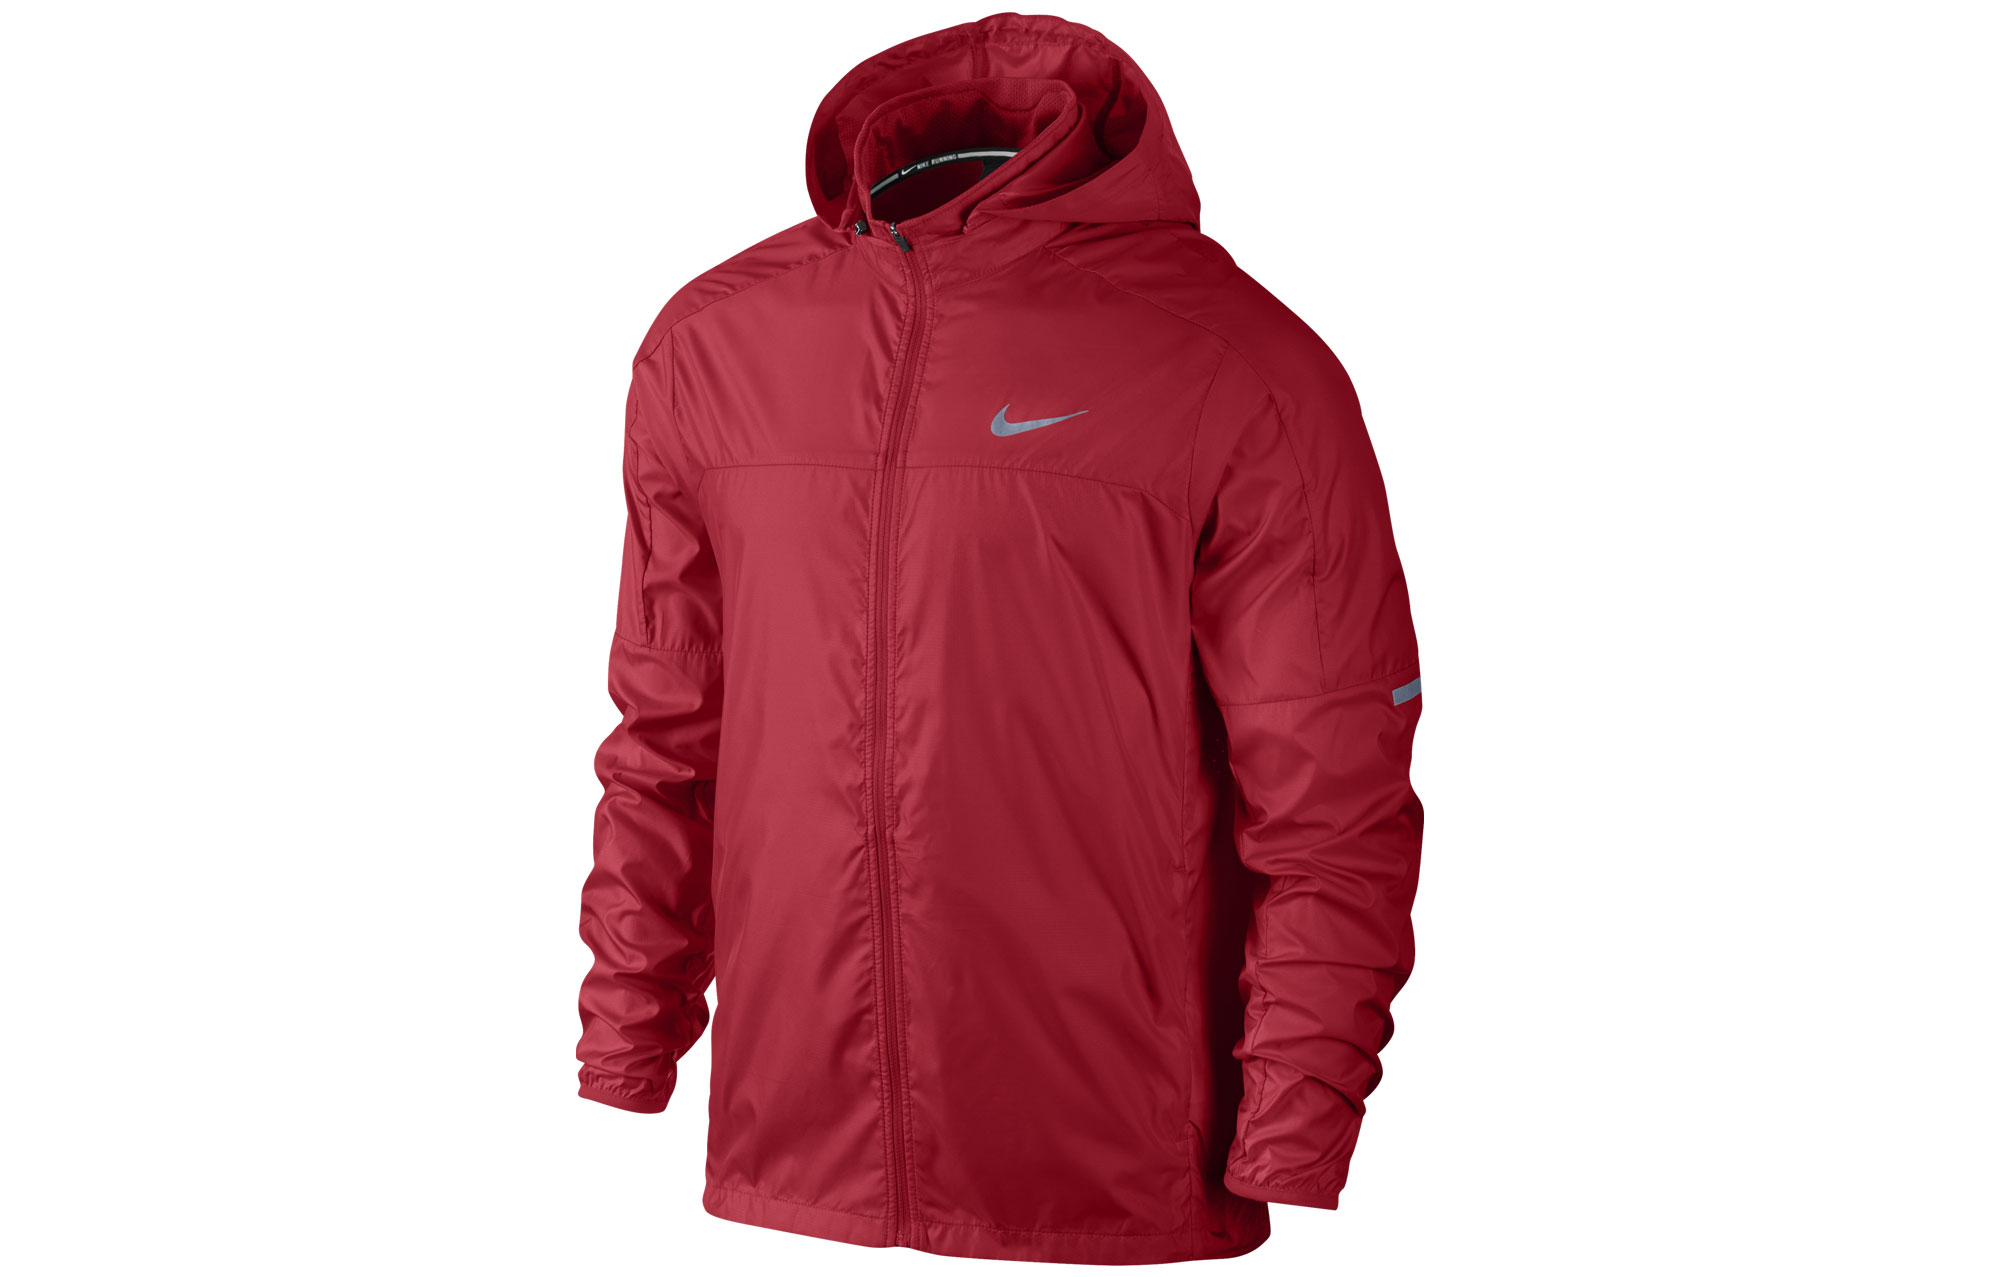 Rojo Hombre Chaqueta Alltricks Nike es Vapor TqtwPx7